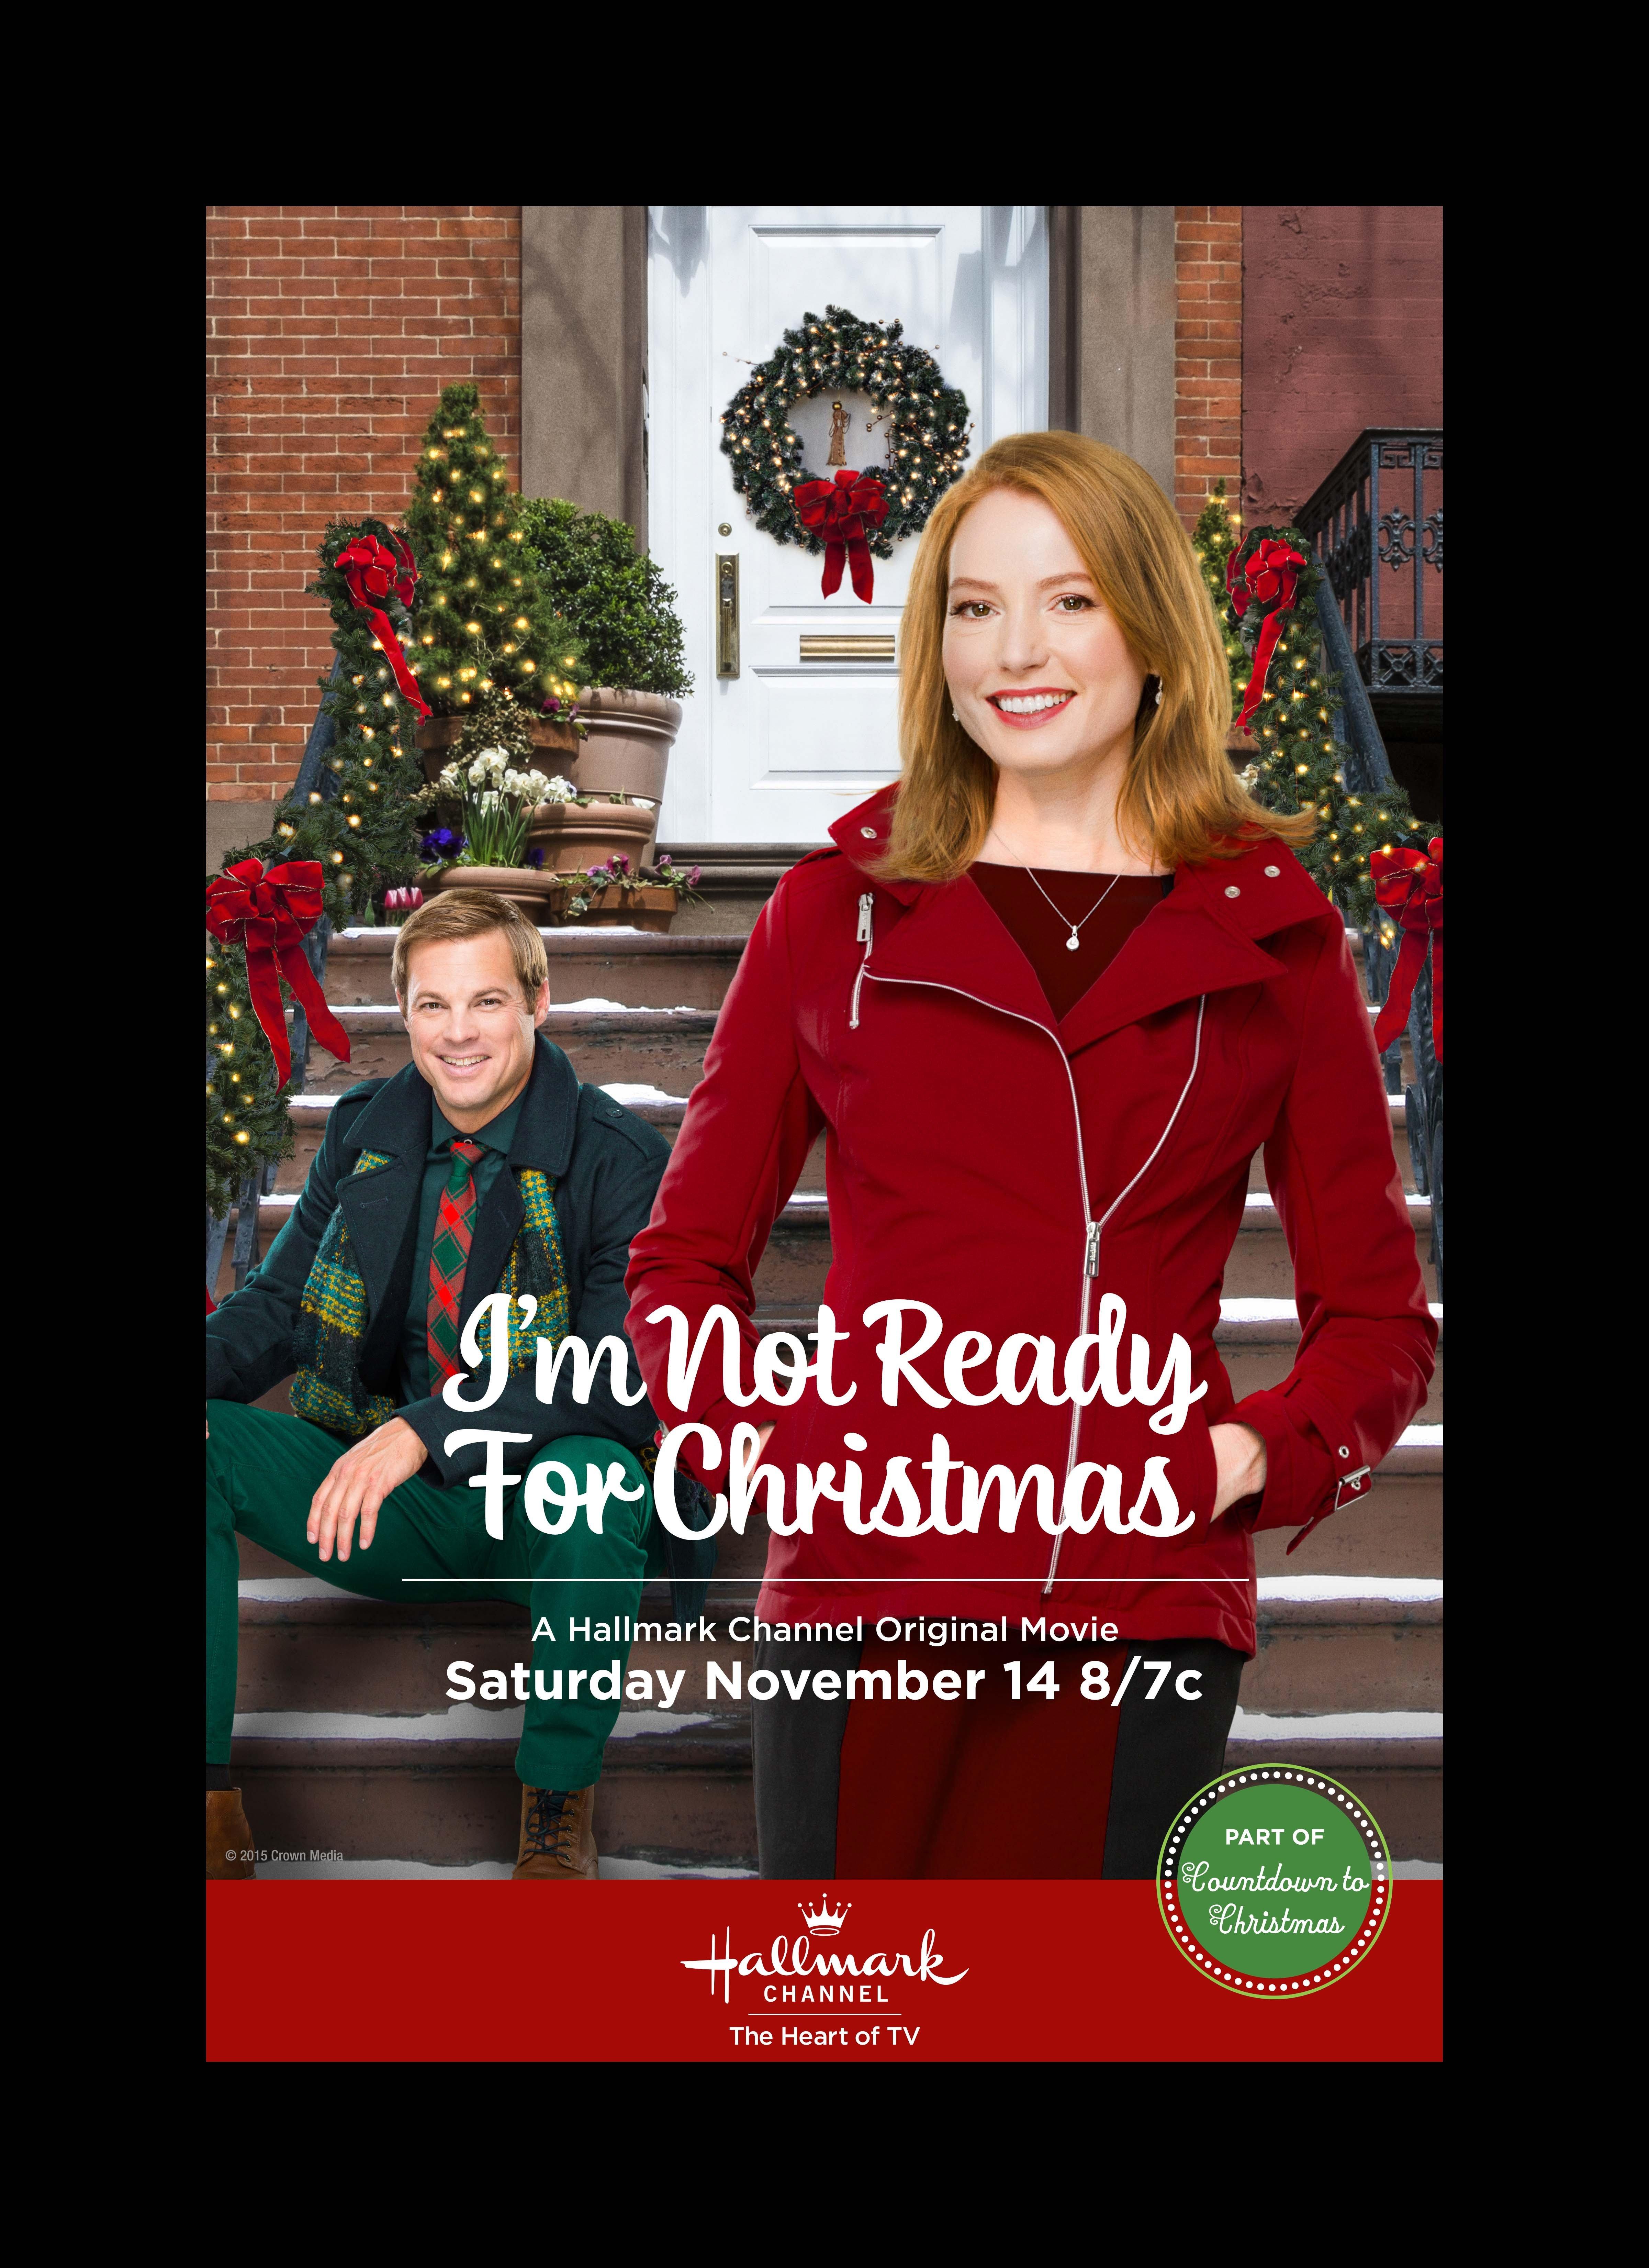 I\'m Not Ready for Christmas (TV Movie 2015) - Photo Gallery - IMDb